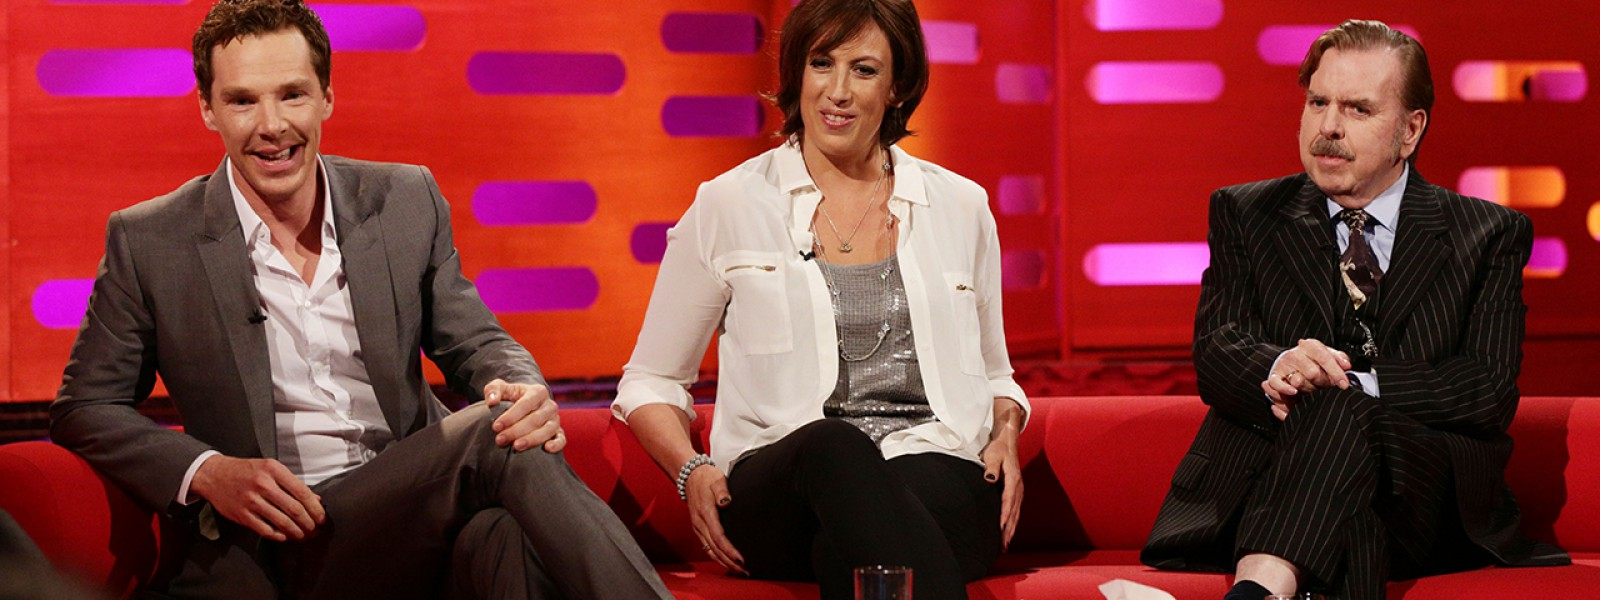 cumberbatch-beyonce-gns-bbc